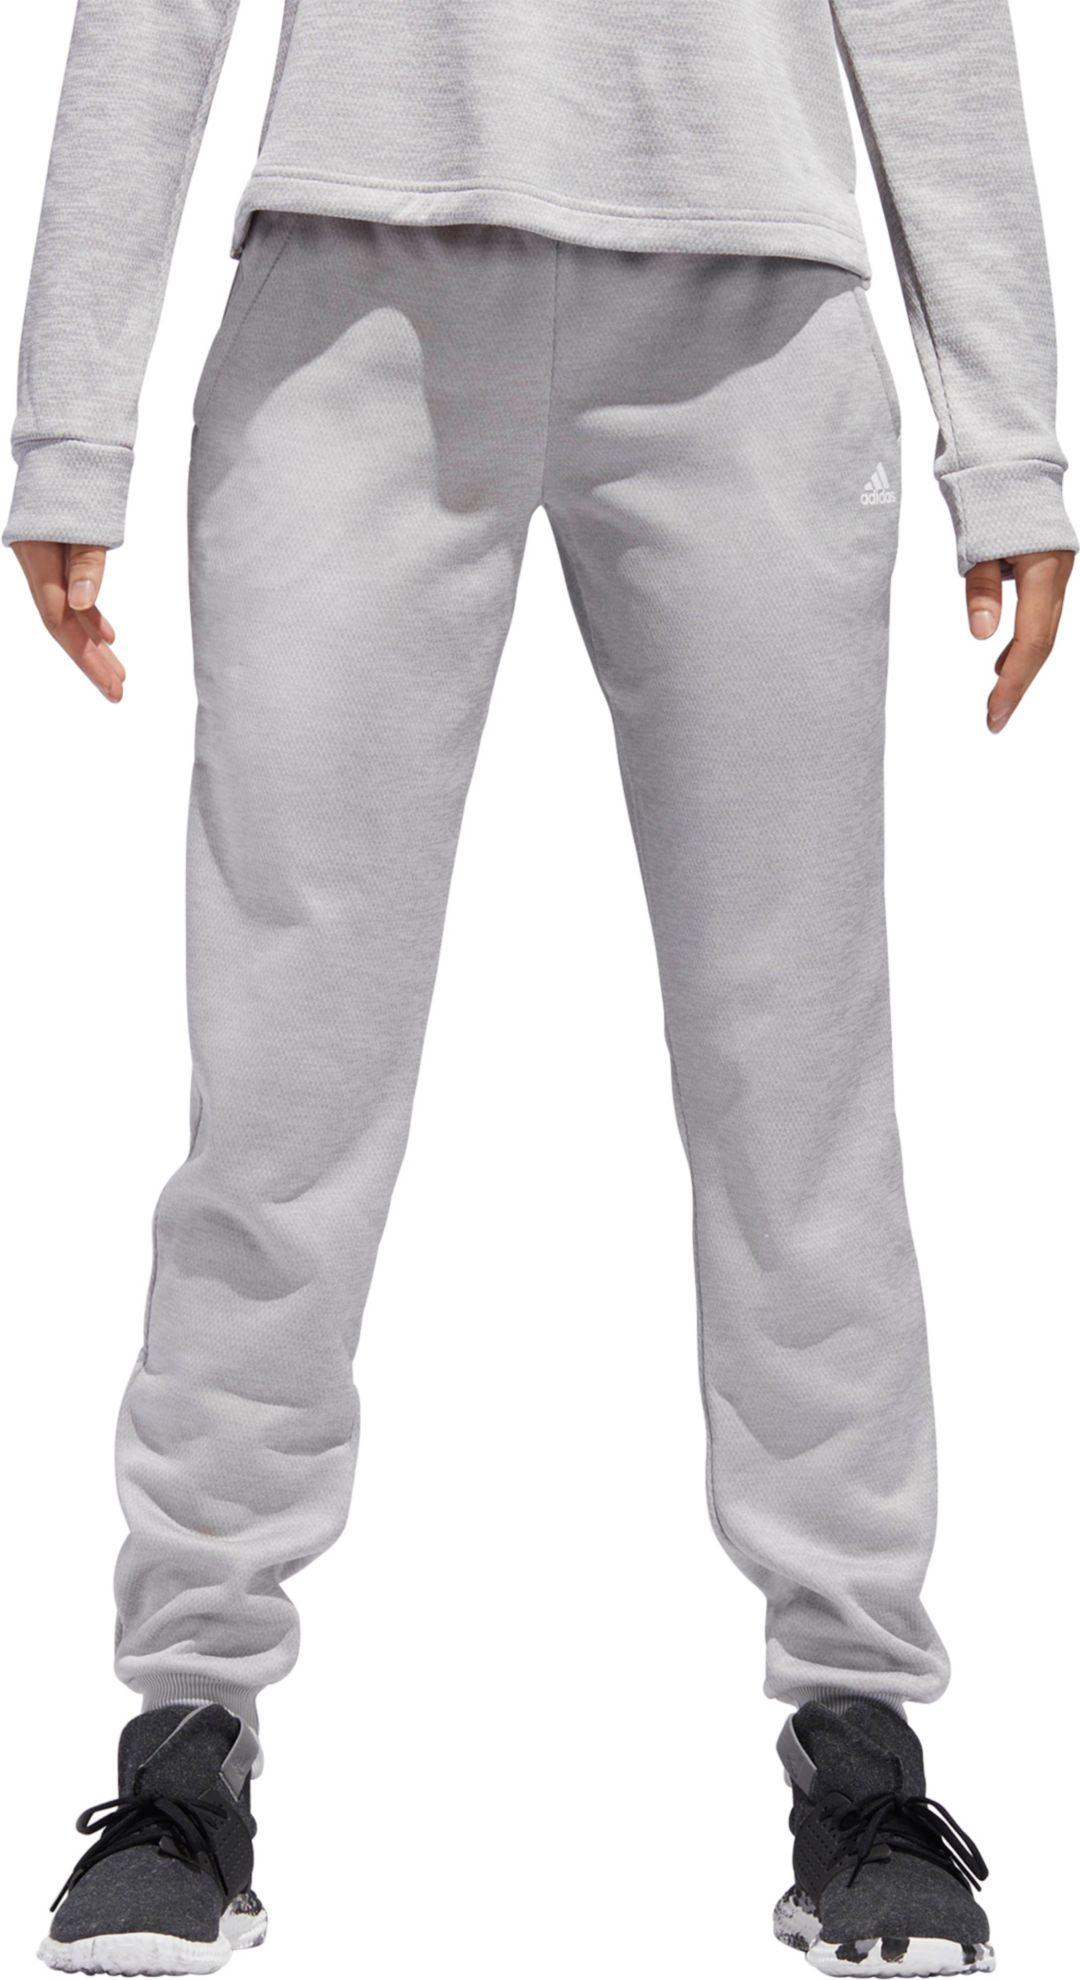 7f02b820 adidas Women's Team Issue Jogger Pants. noImageFound. Previous